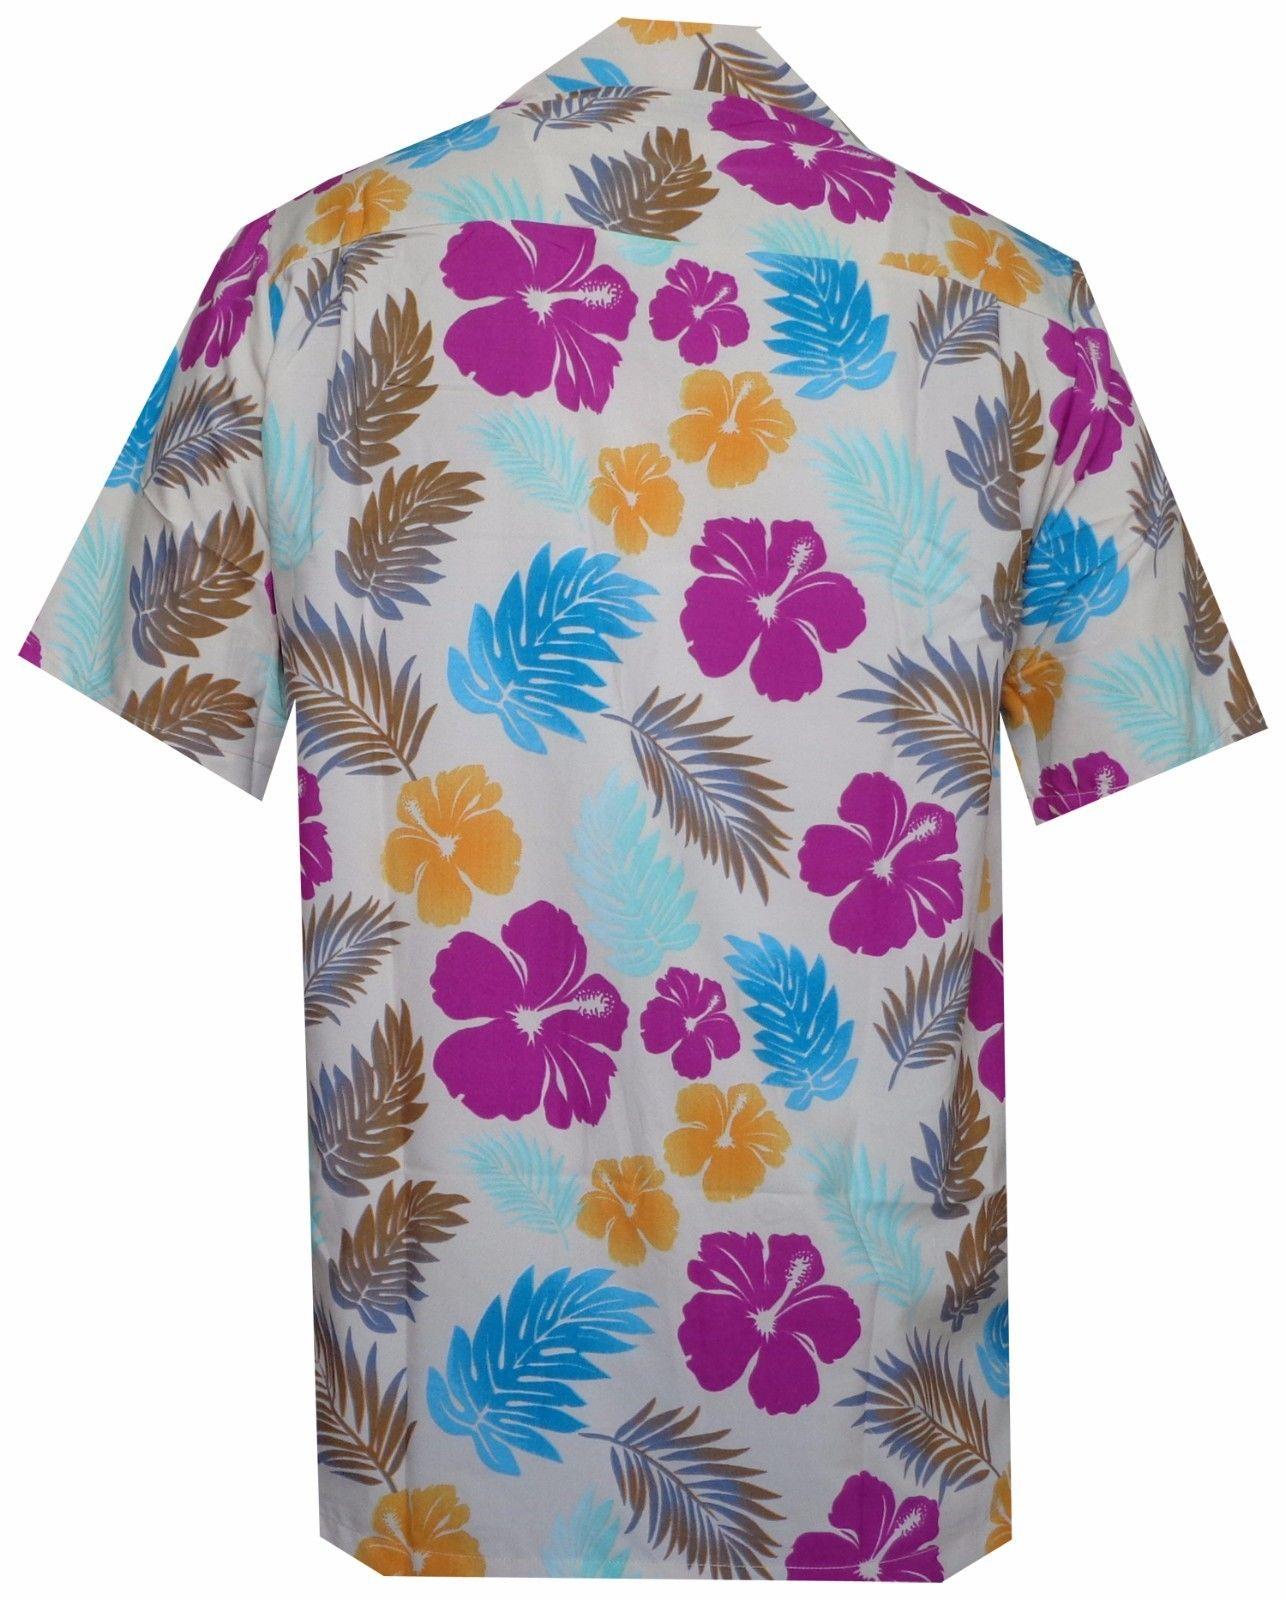 Hawaiian-Shirt-Mens-Hibiscus-Floral-Leaf-Print-Beach-Aloha-Camp-Party thumbnail 20